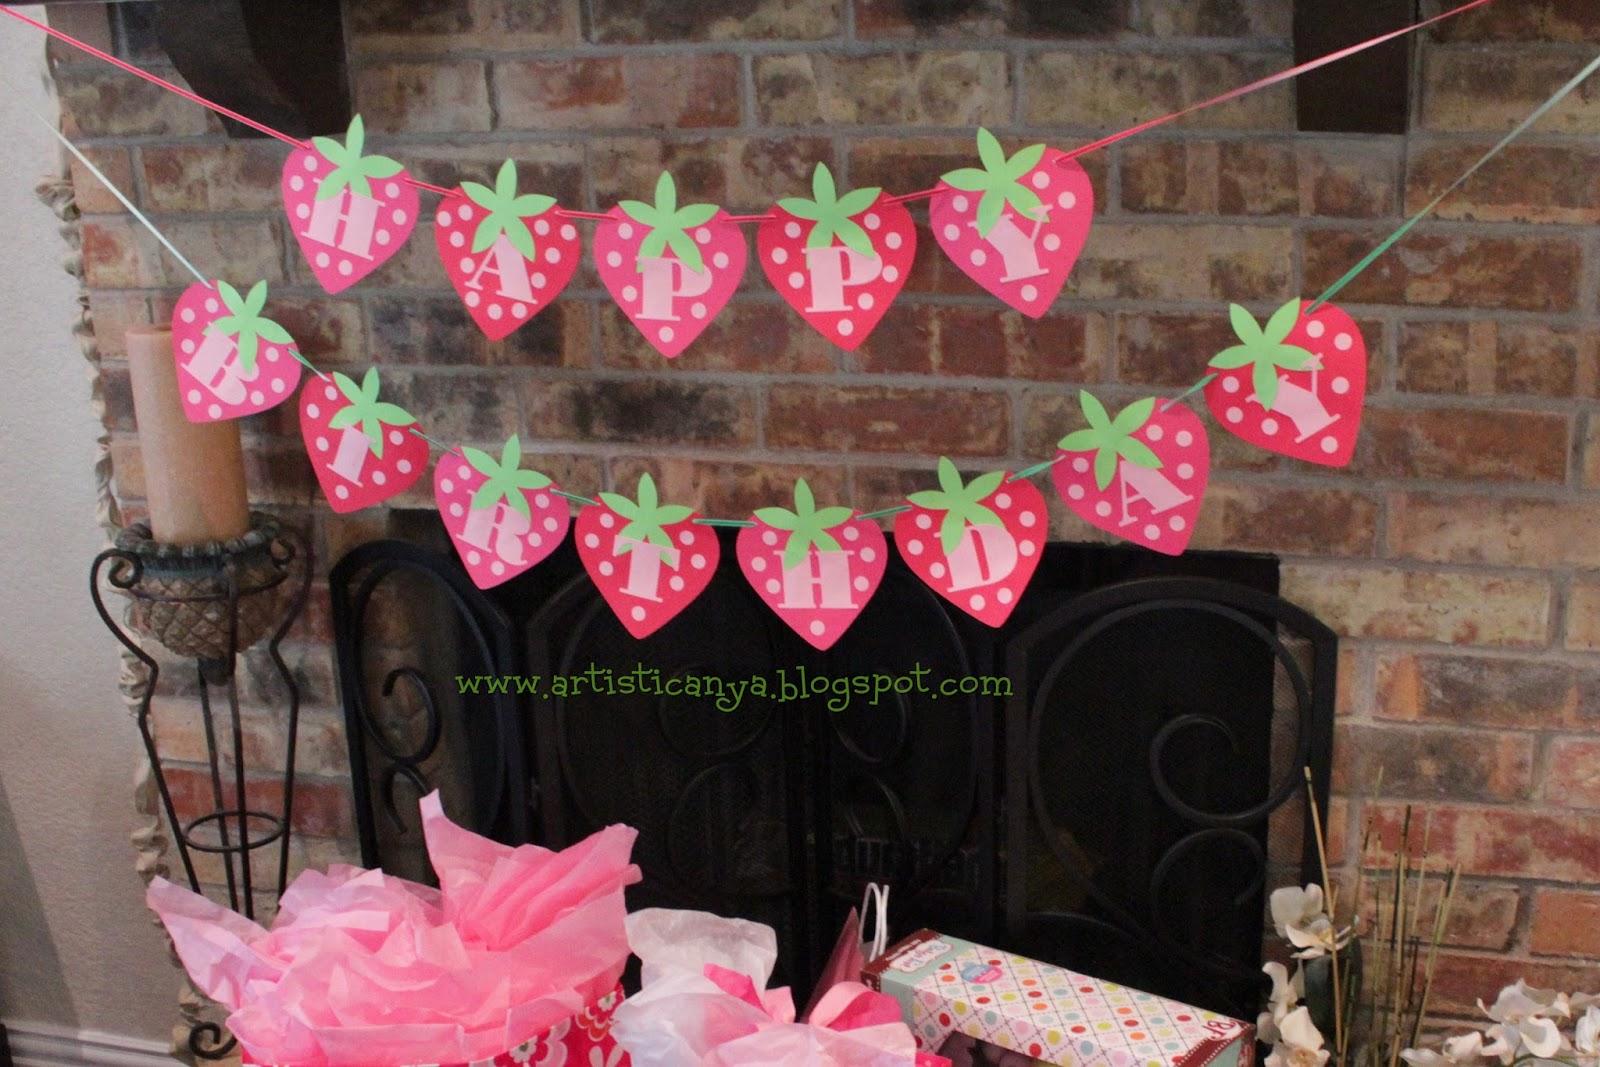 Artistic Anya Designs: Strawberry Shortcake Party